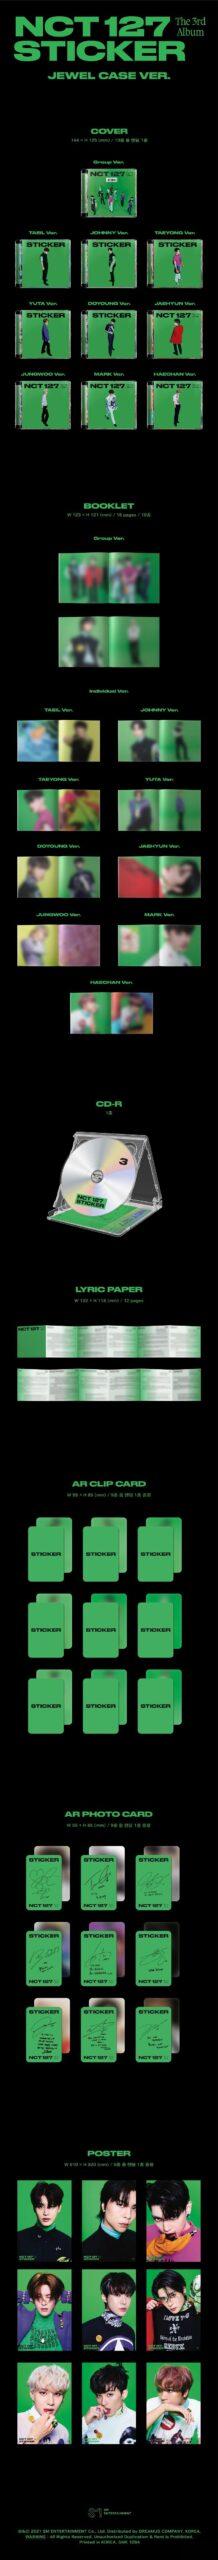 3rd Album de NCT127 Sticker Jewel Case Ver. Random Ver. 1